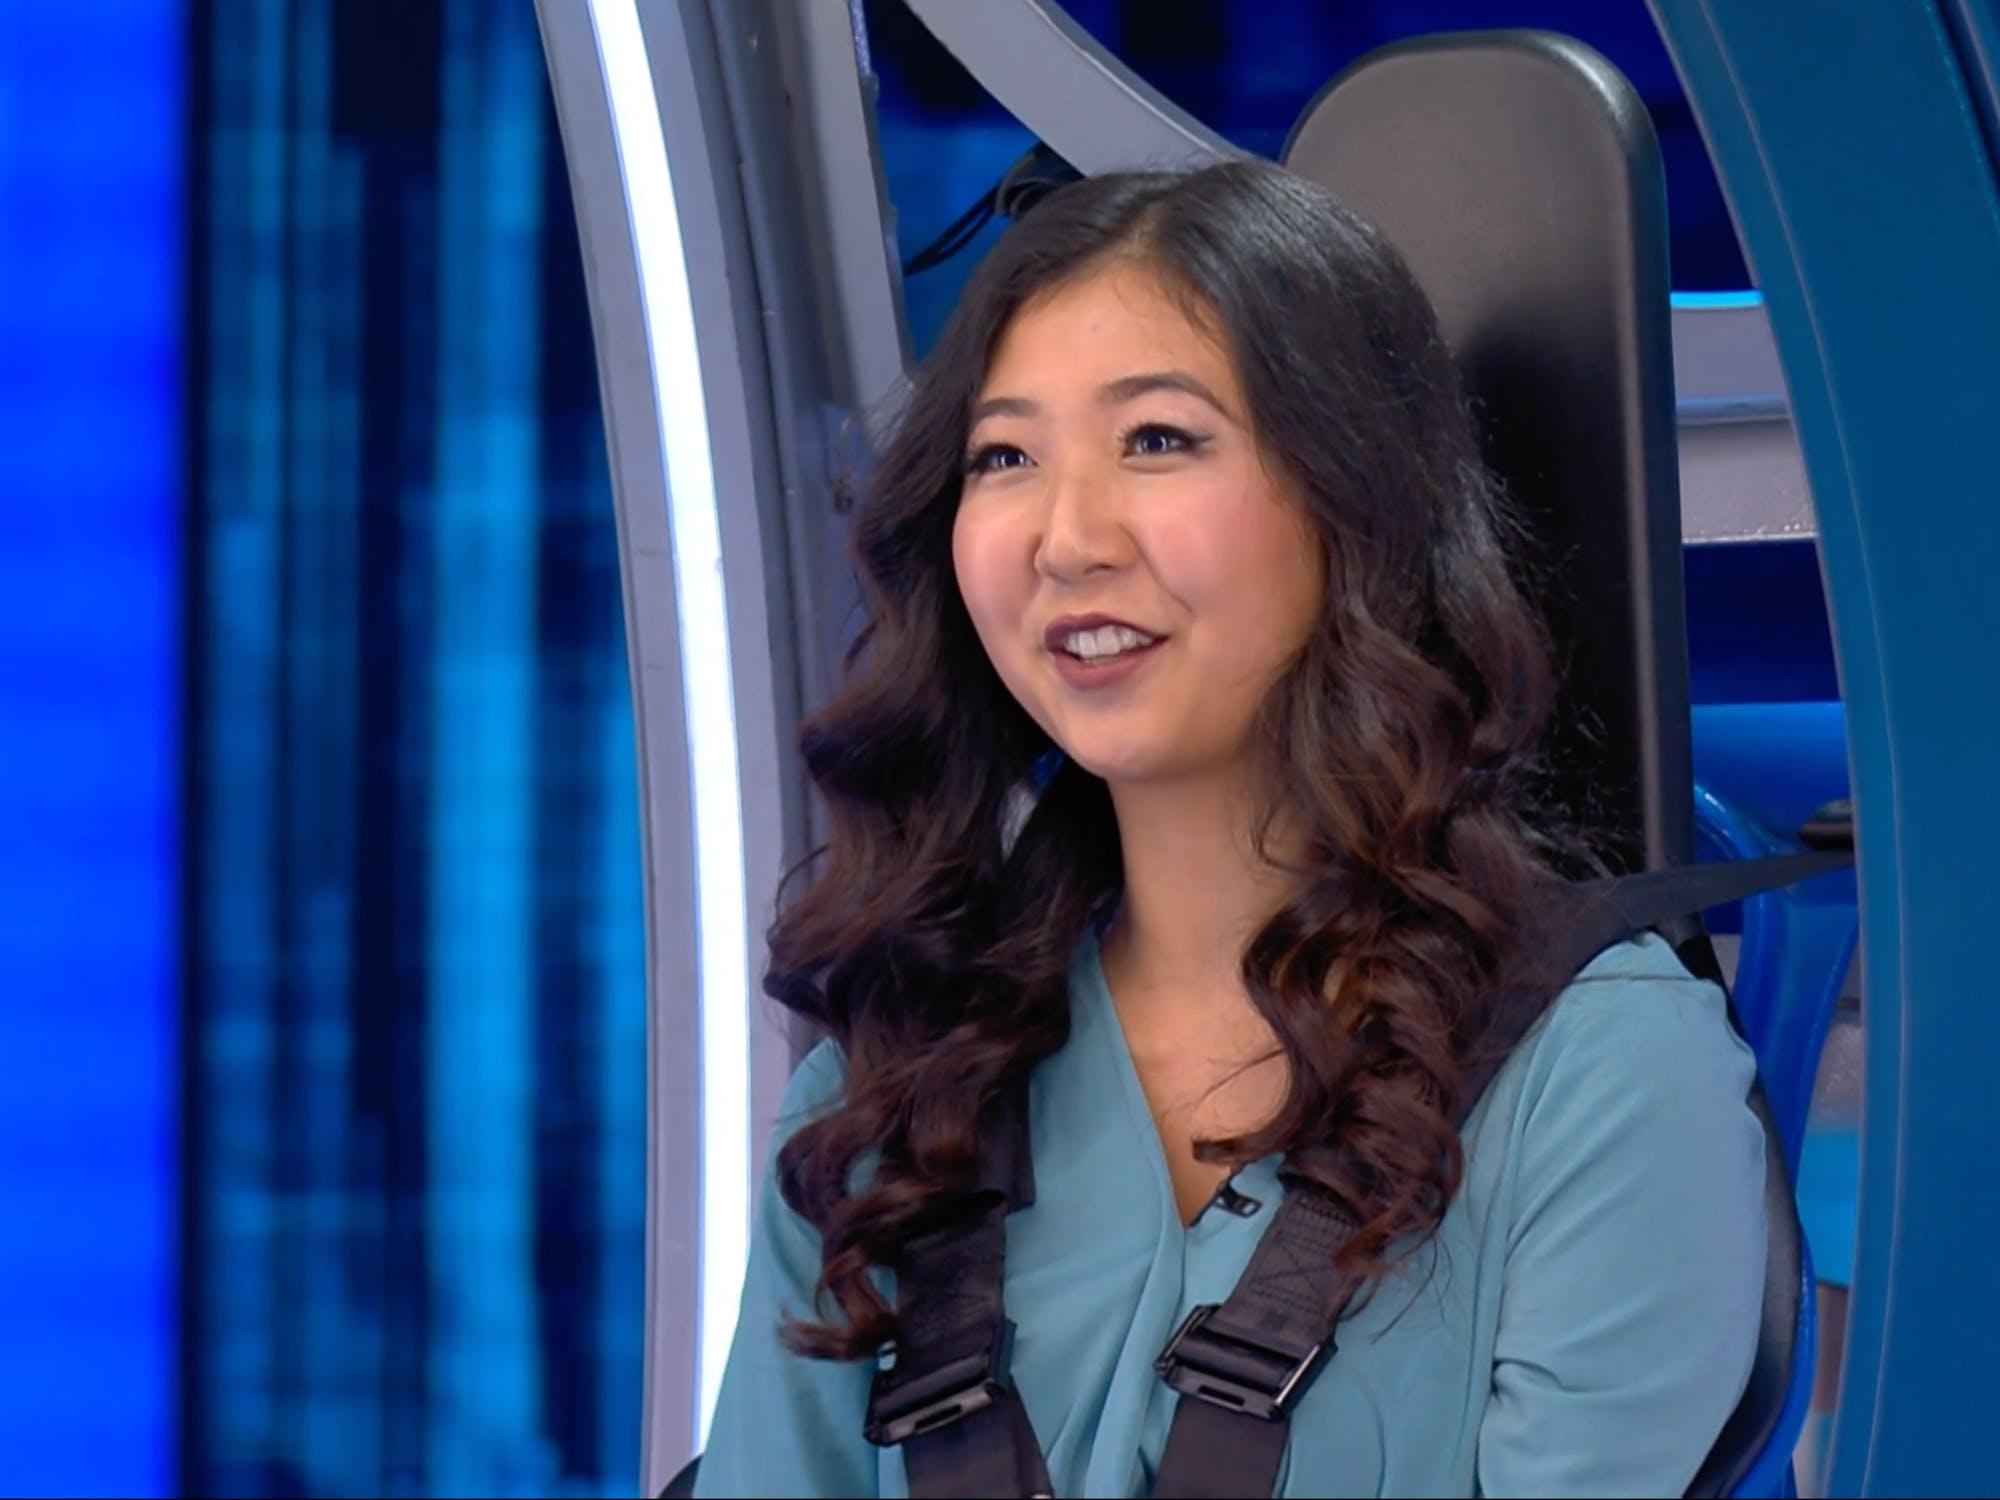 Headshot of asian female